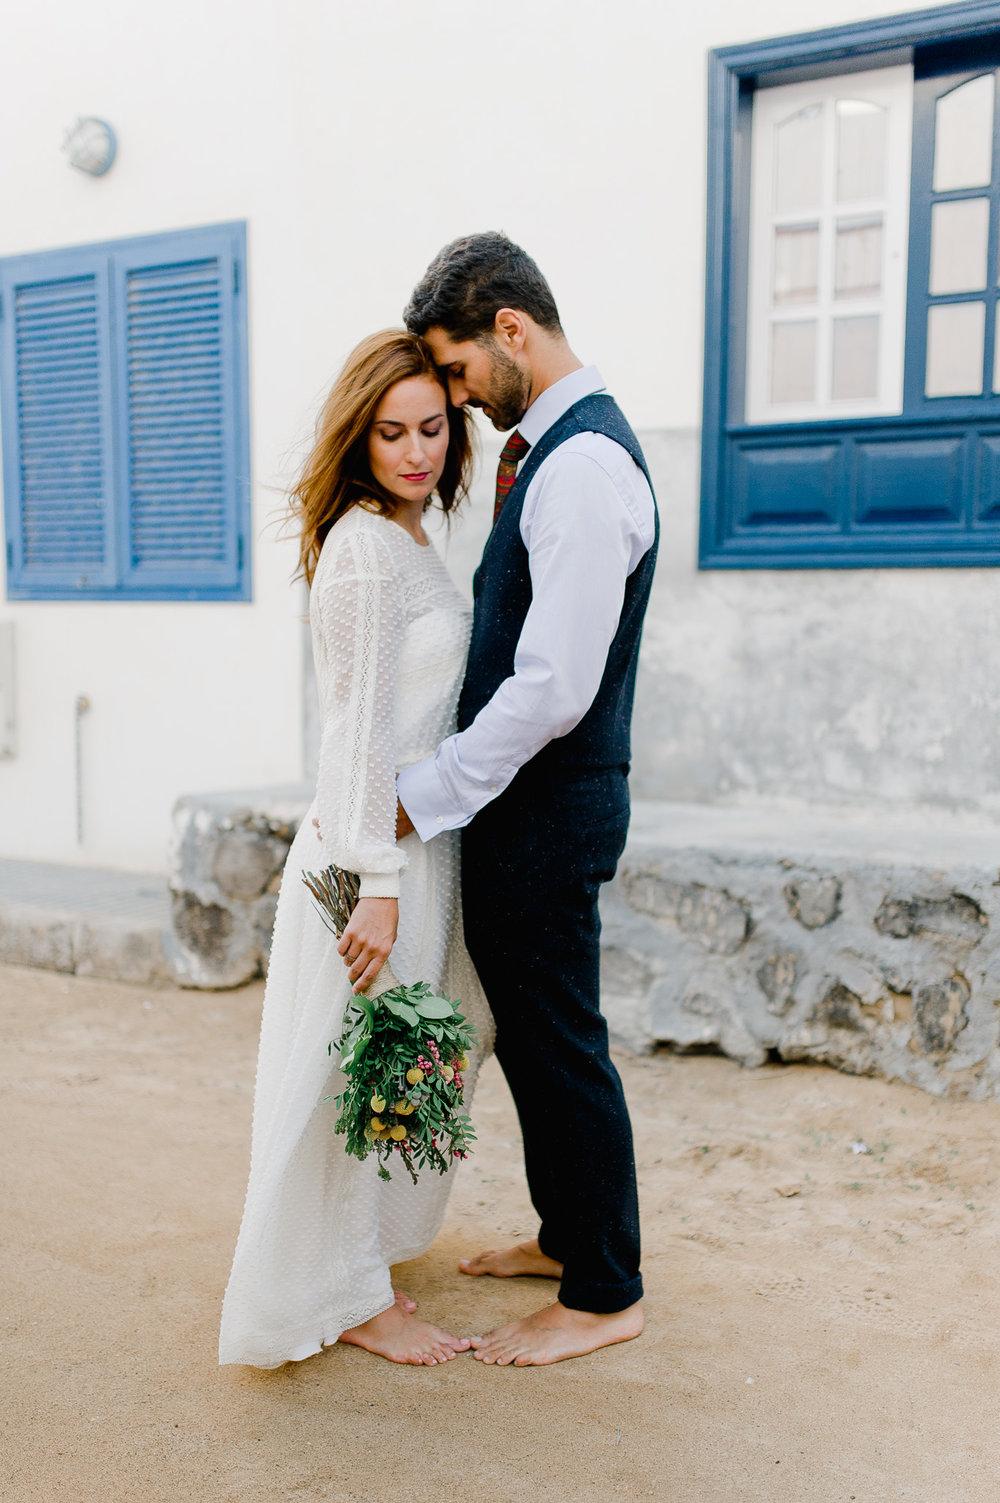 anna hari wedding photography-16.jpg